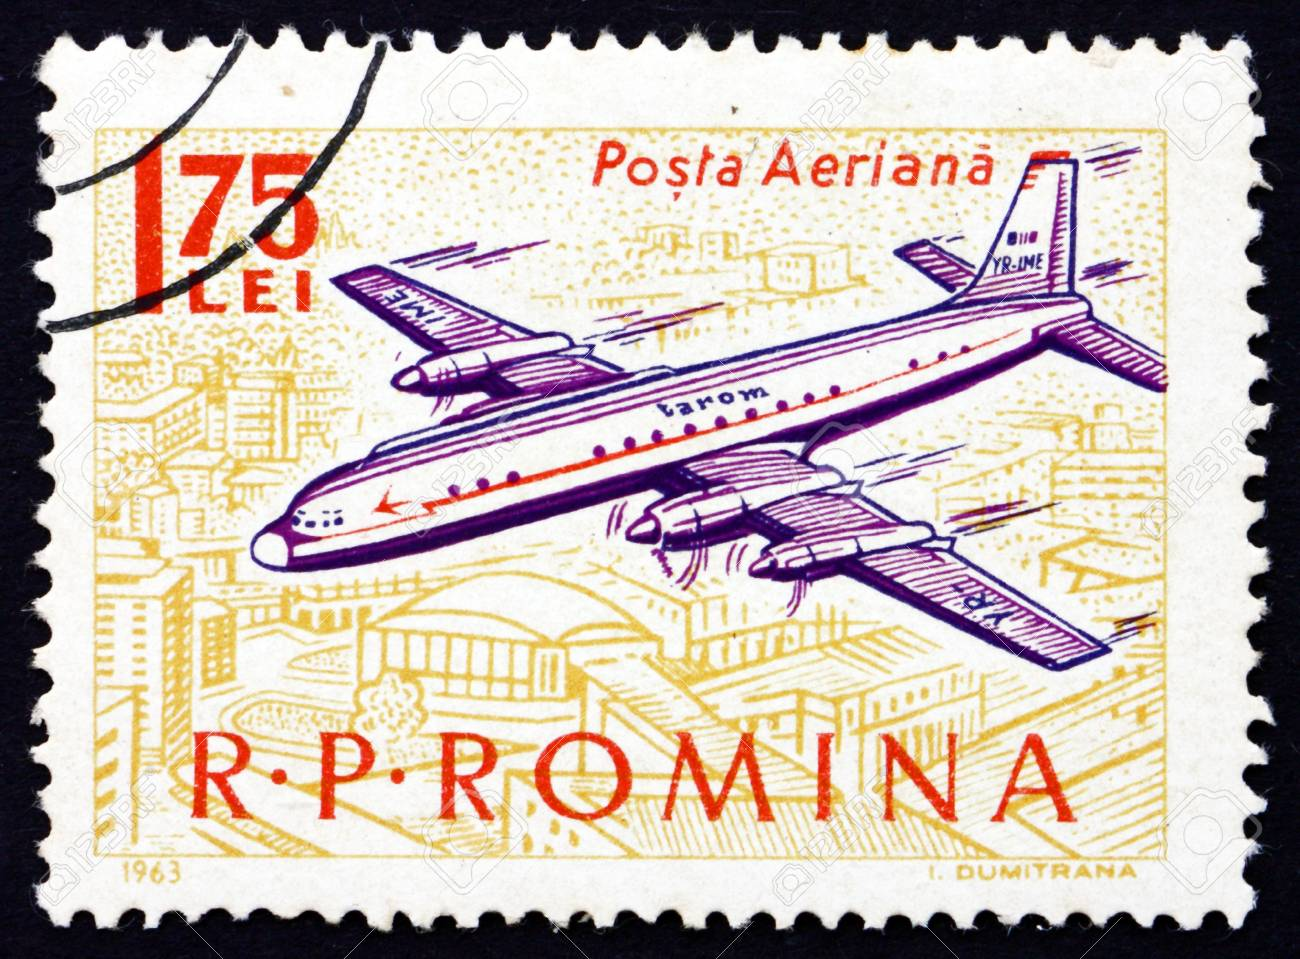 ROMANIA - CIRCA 1963: a stamp printed in the Romania shows Plane over City, circa 1963 Stock Photo - 17063402